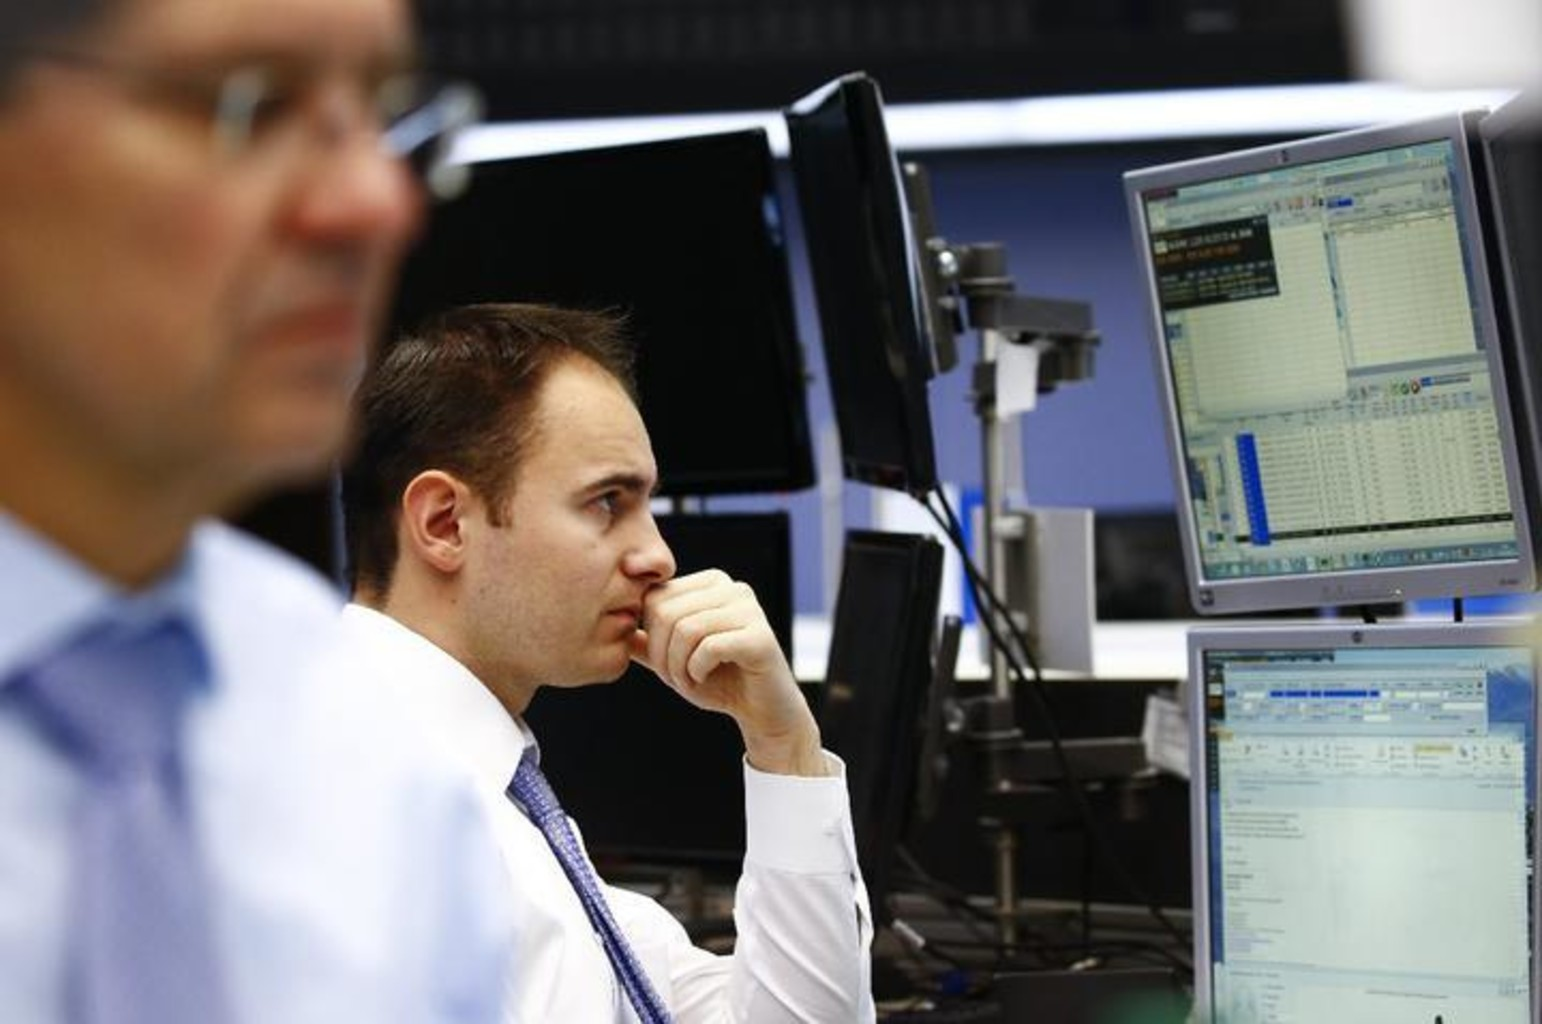 Birzha ekonomika torgi reuters rtx23de4 %281%29